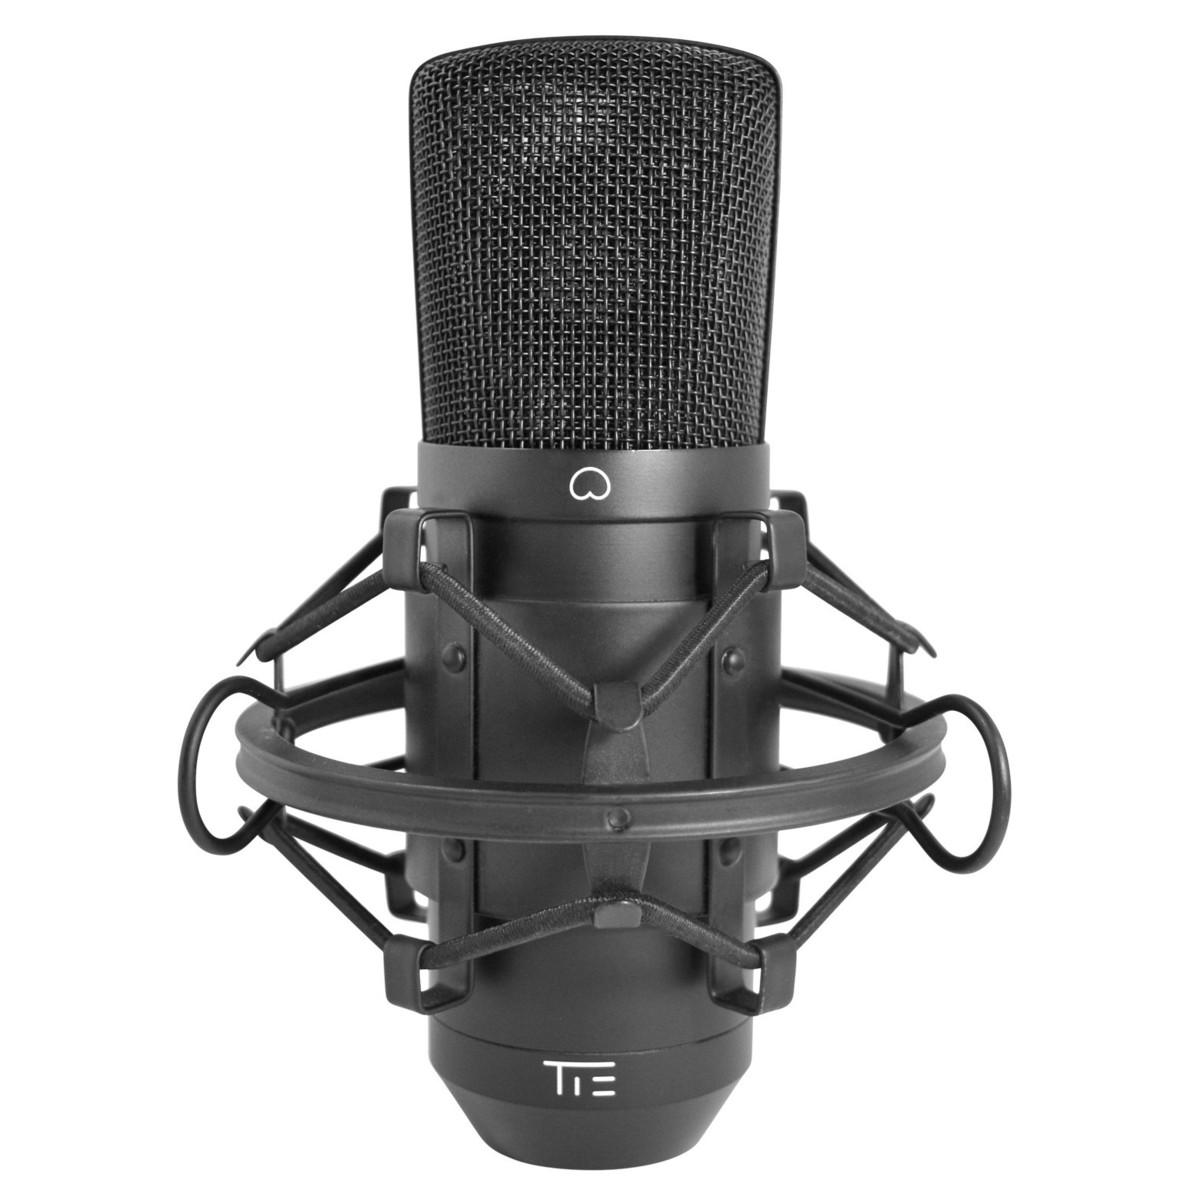 Tie Studio Usb Large Diaphragm Condenser Mic At Gear4music Microphone Ribbon Diagram In Cradle Loading Zoom